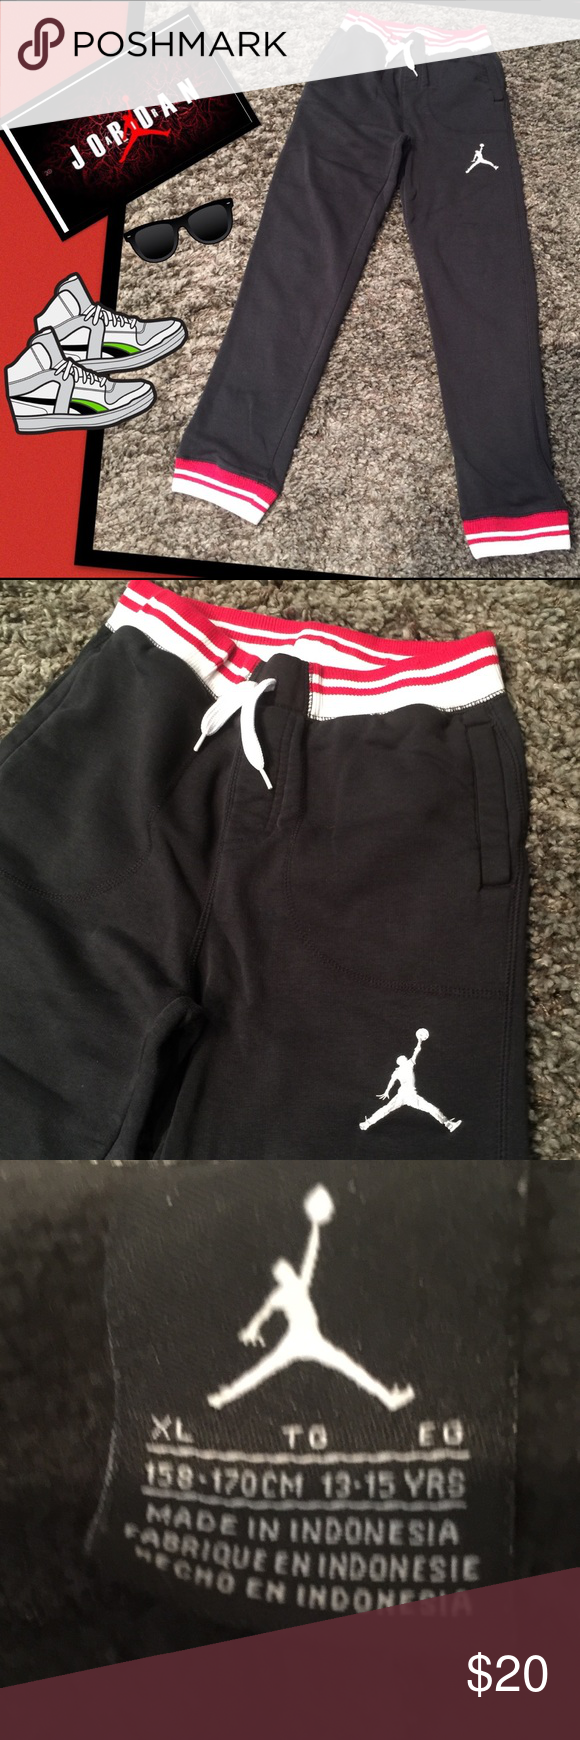 50f54bf6a24593 Kids Jordan Sweatpants Footlocker sweatpants Jordan.. Great condition..  Jordan Bottoms Sweatpants   Joggers